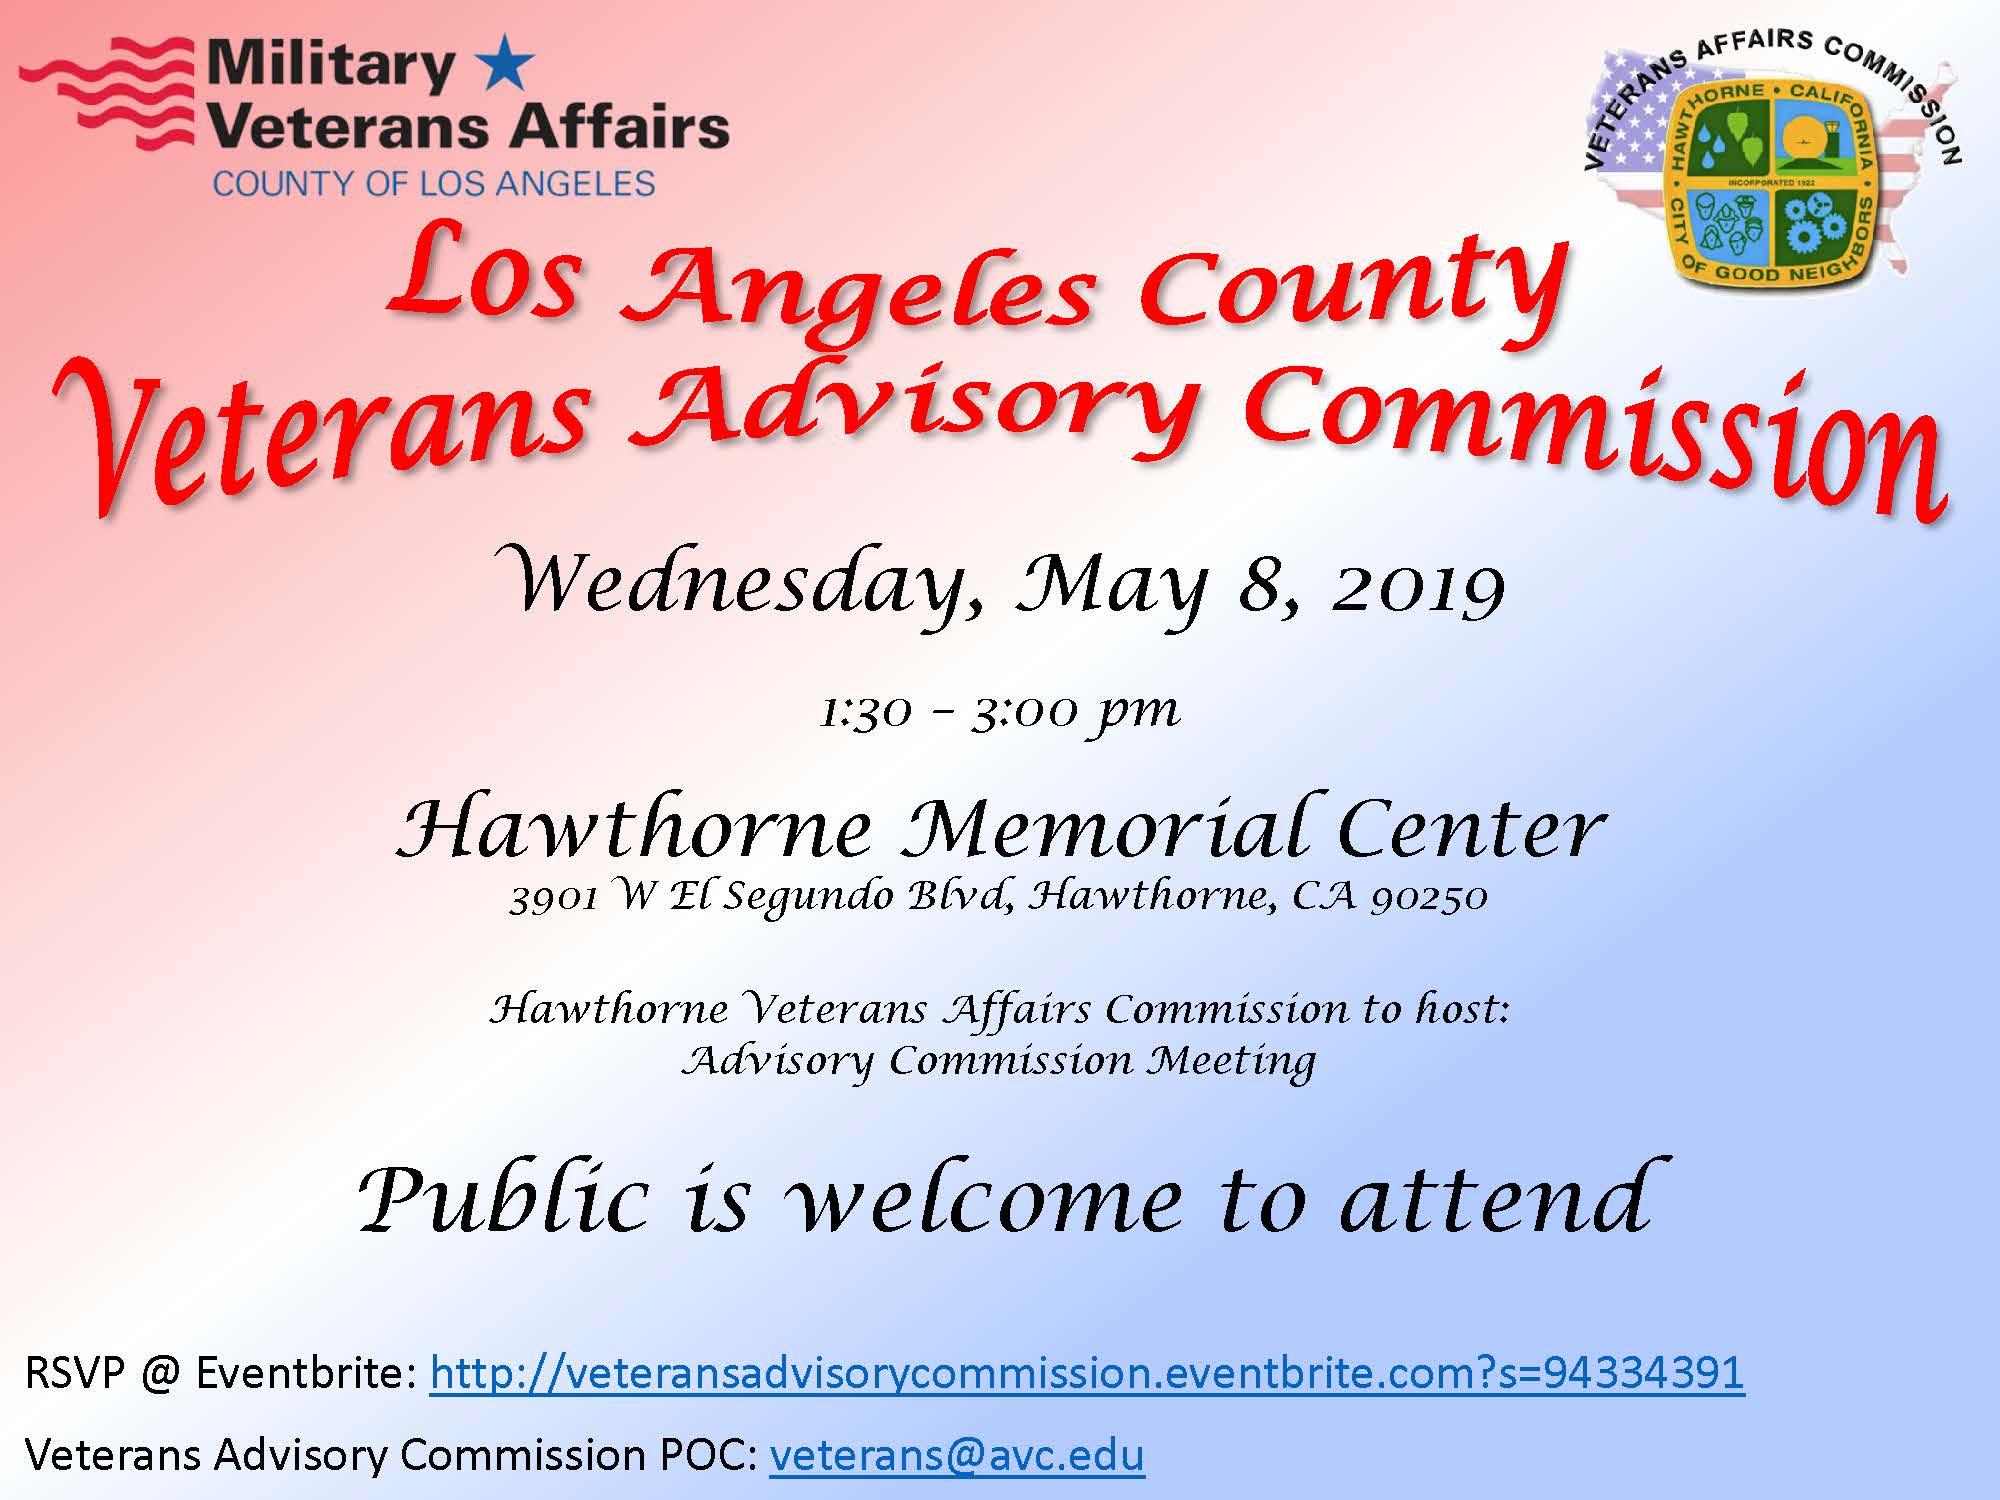 LA Country Veterans Advisory Commission meeting